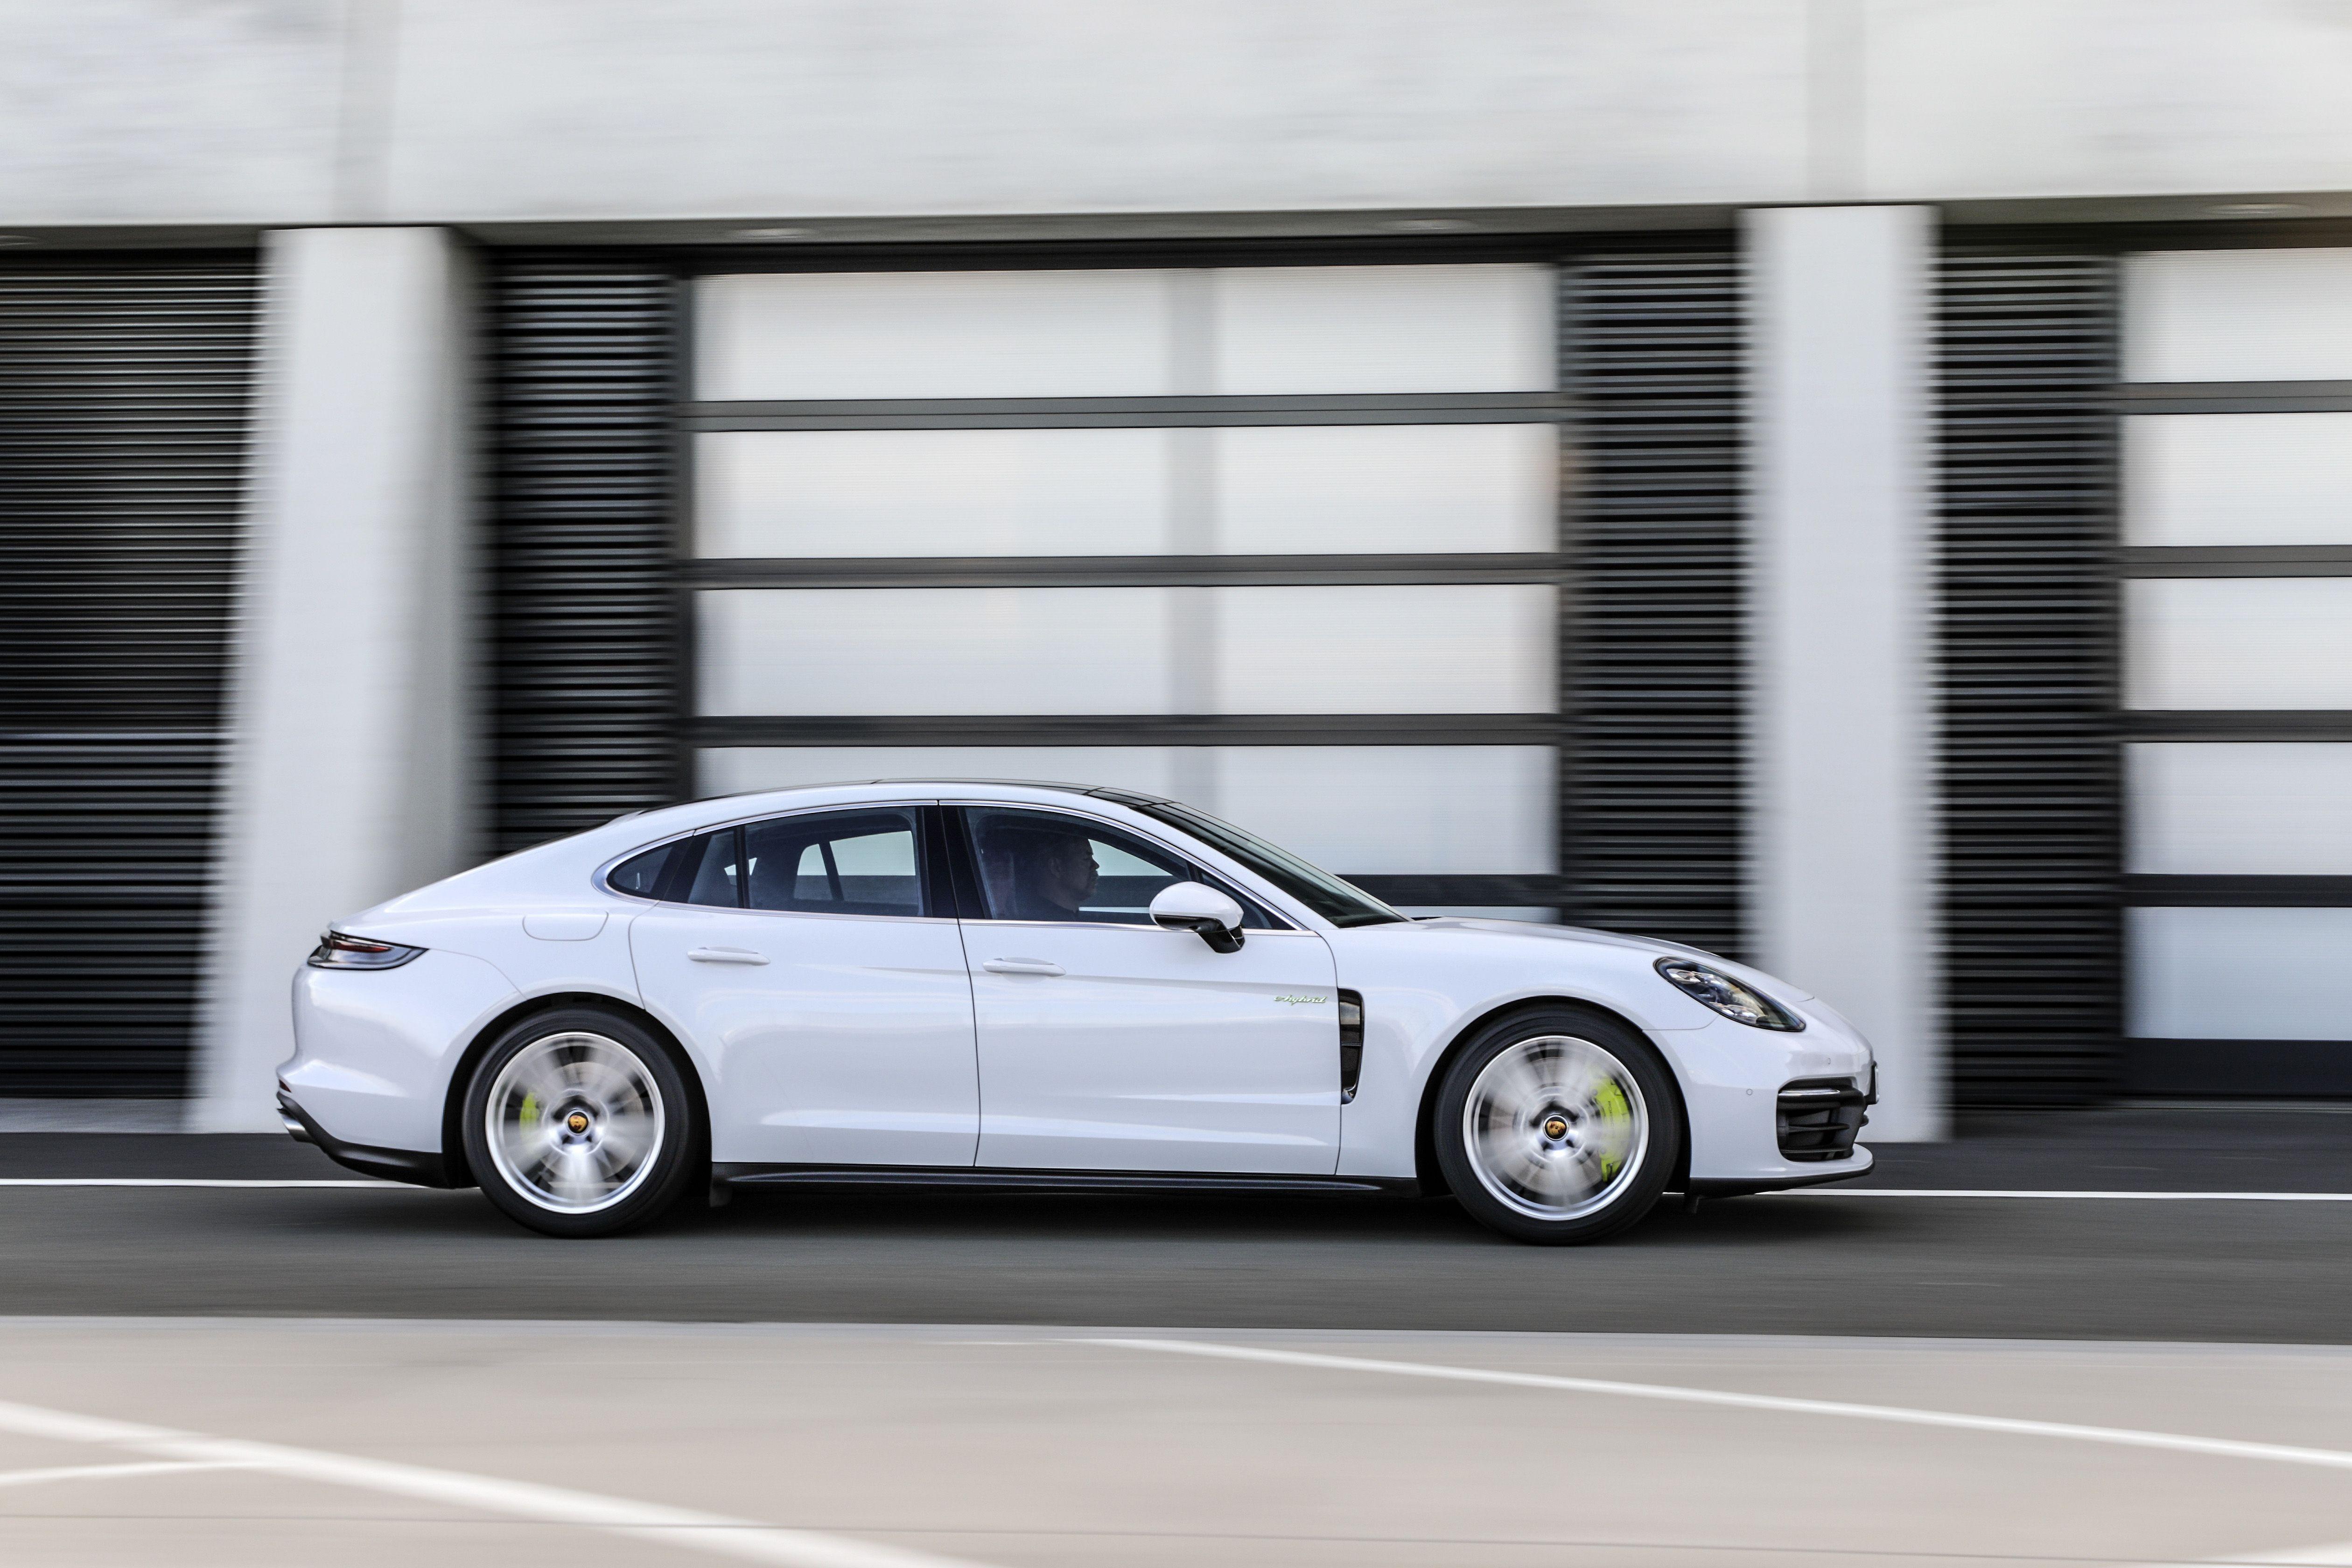 2020 The Porsche Panamera Ratings